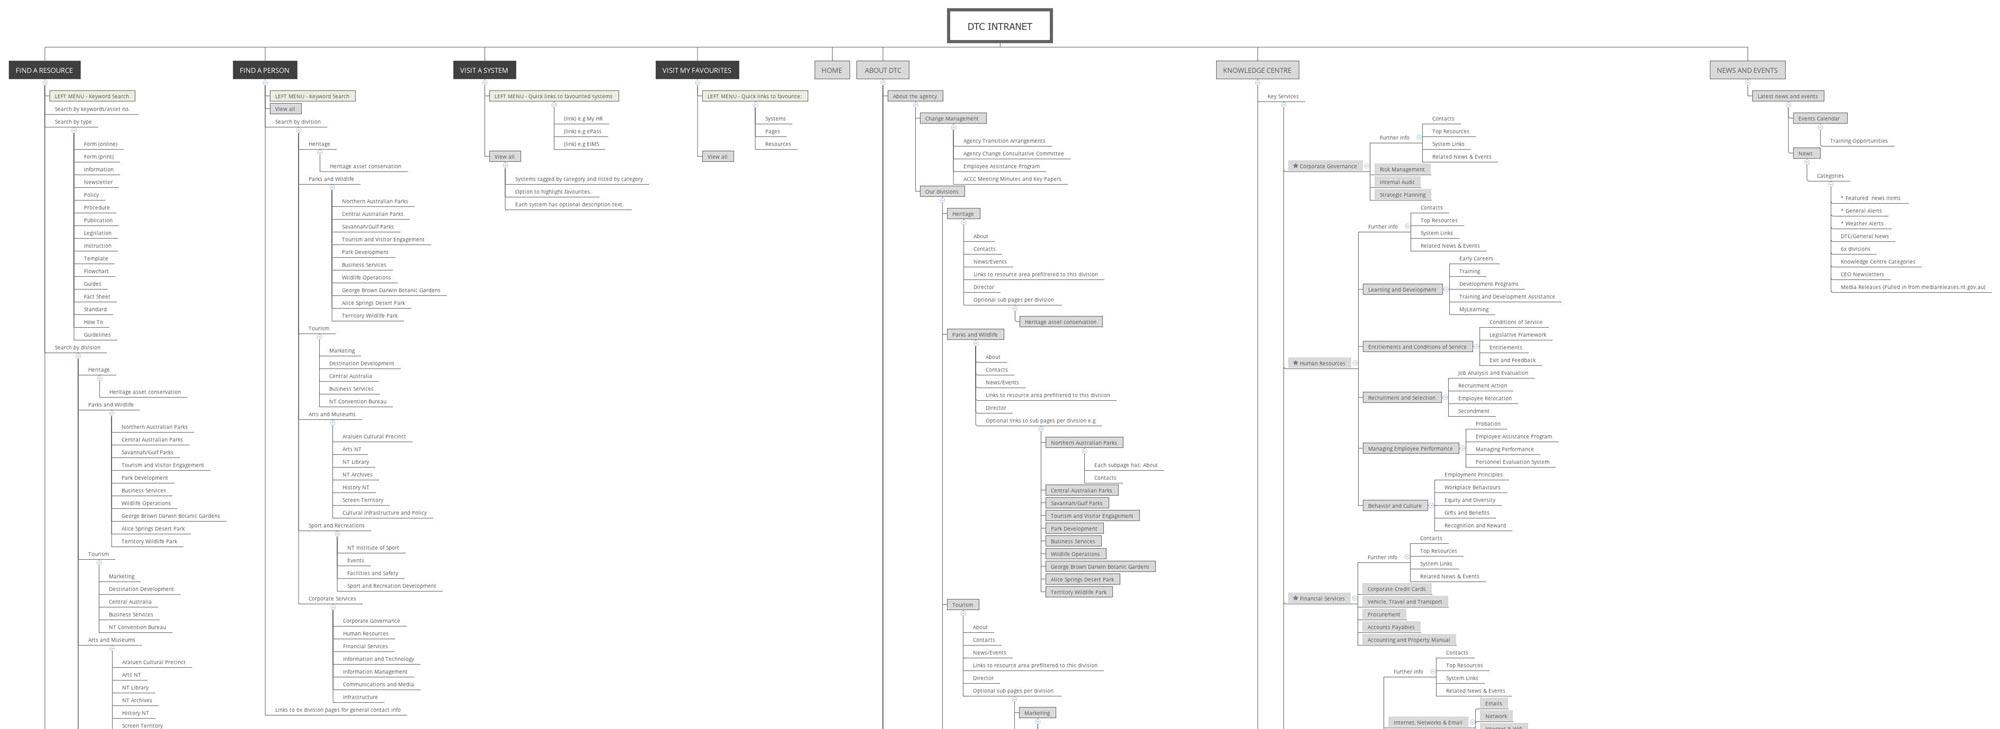 DTC-Intranet-FullExtend.jpg